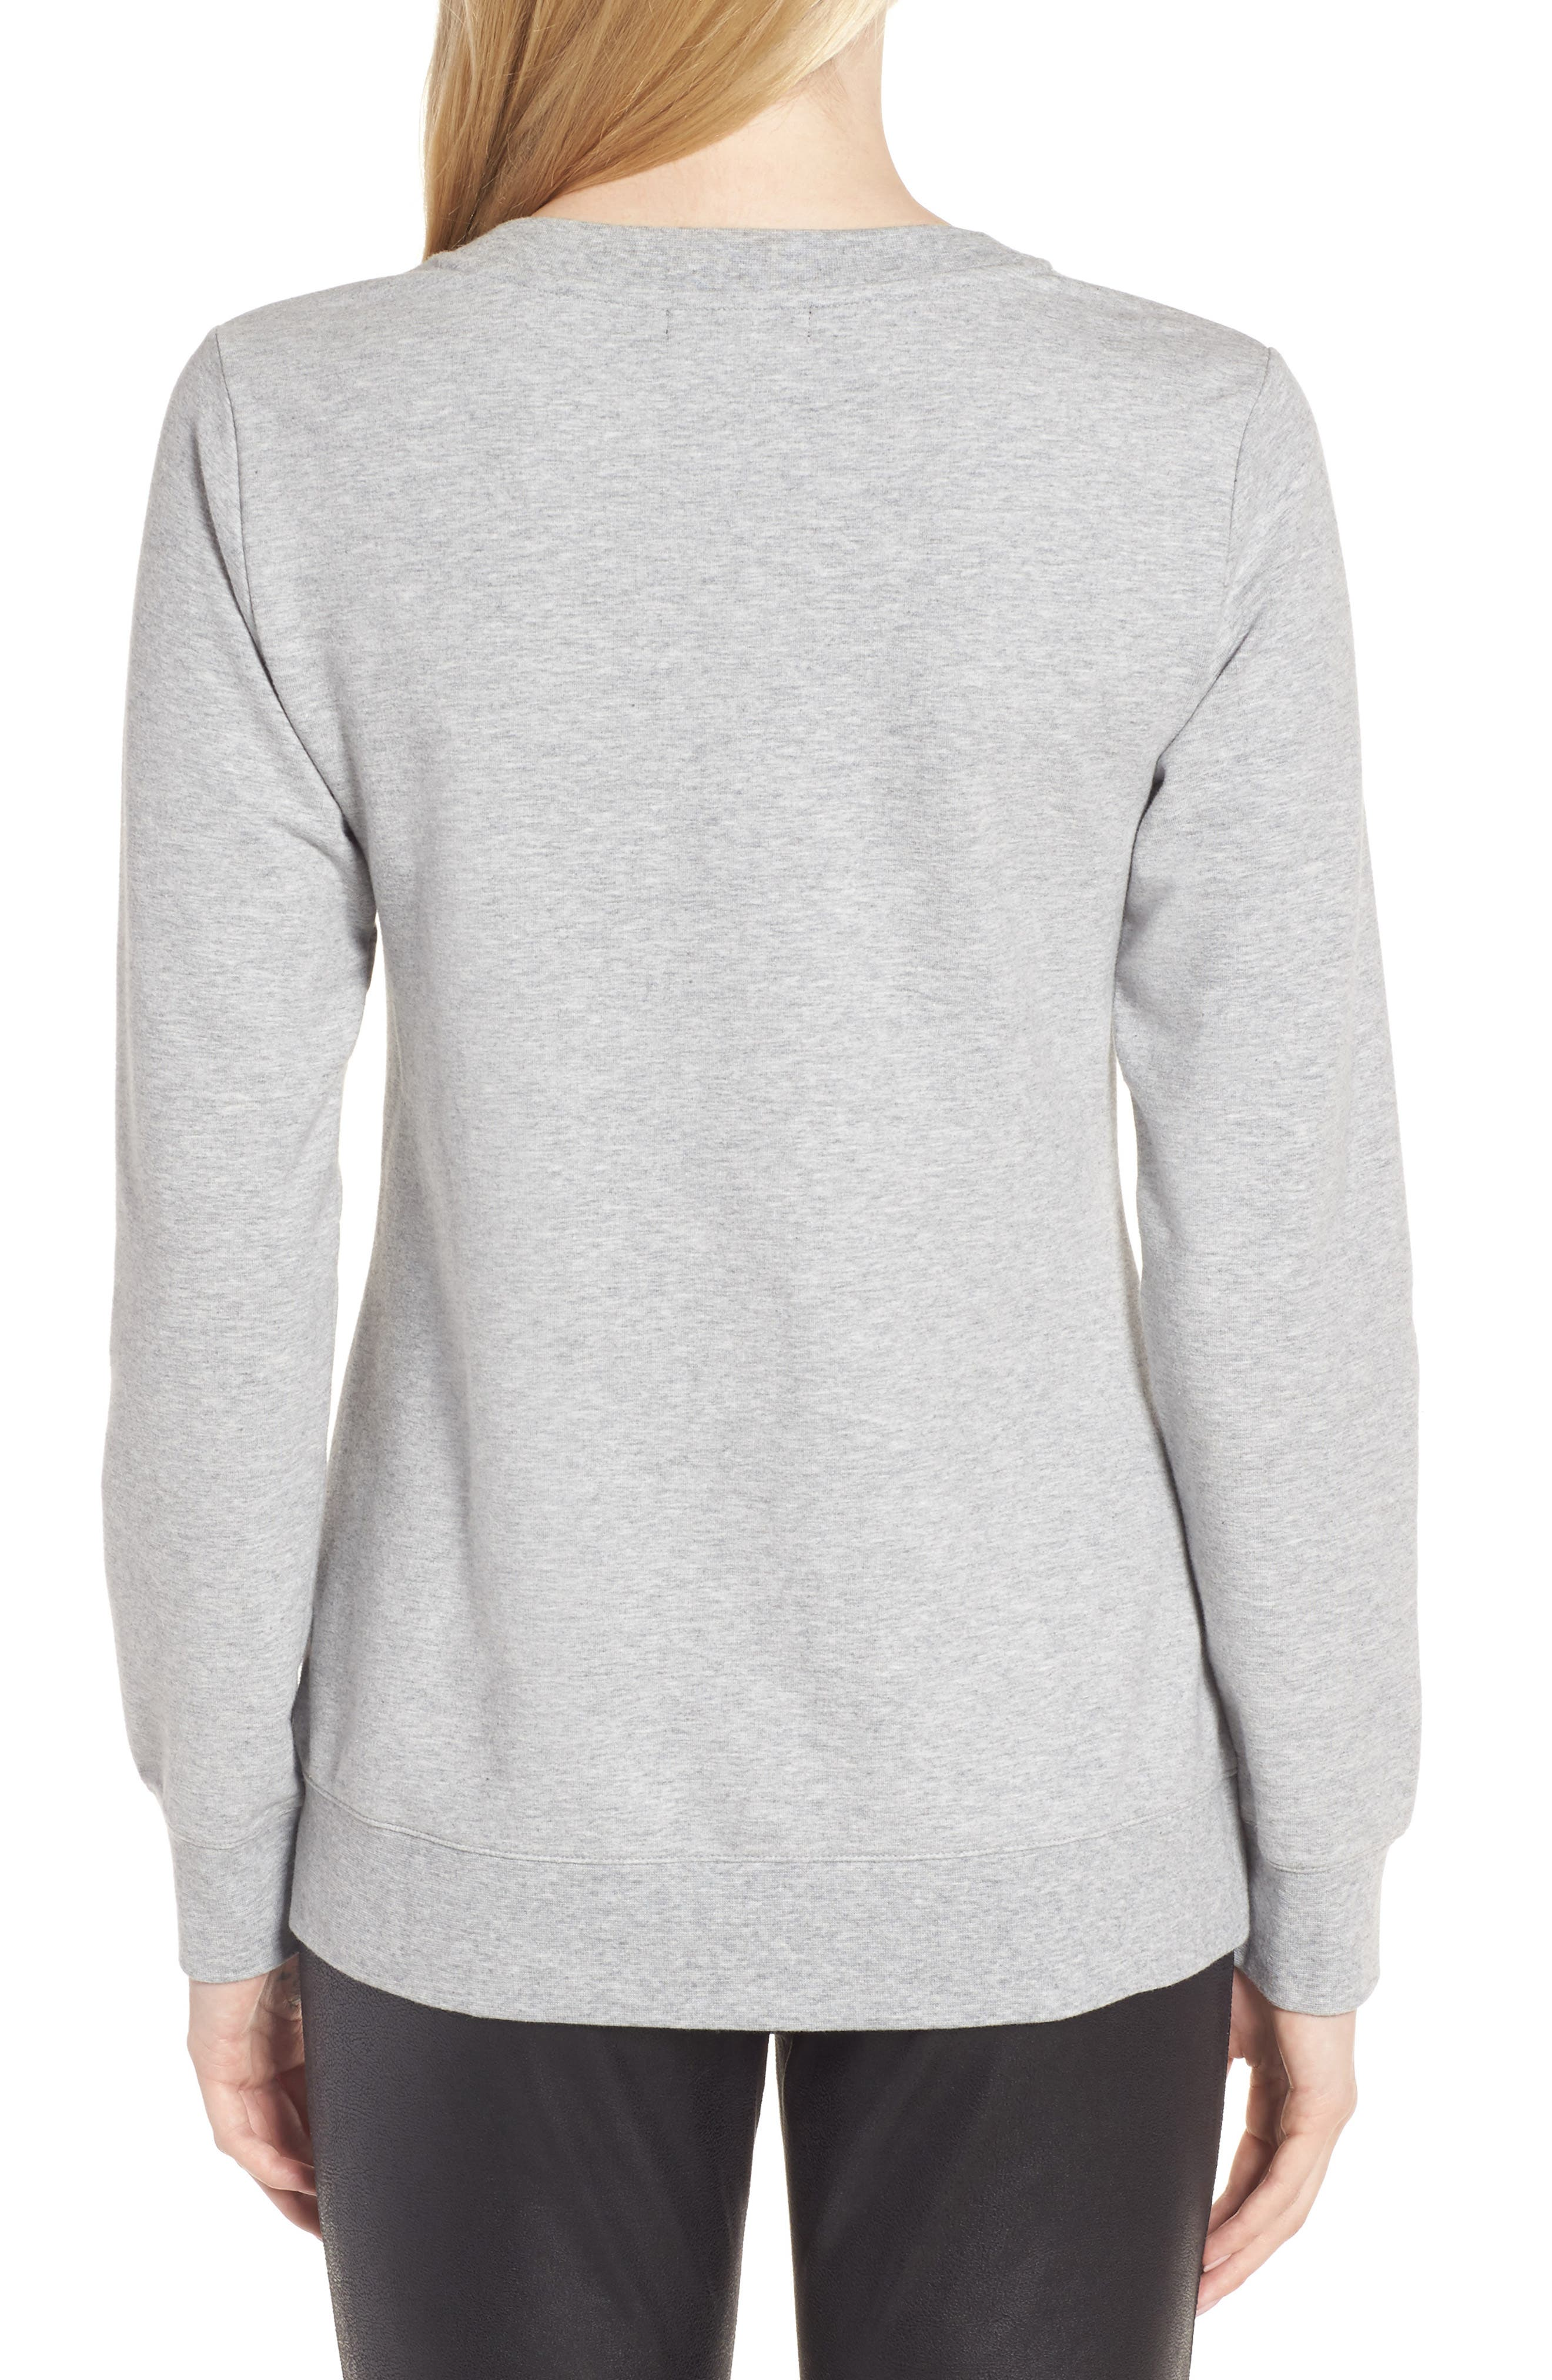 Lace-Up Sweatshirt,                             Alternate thumbnail 2, color,                             Grey Heather